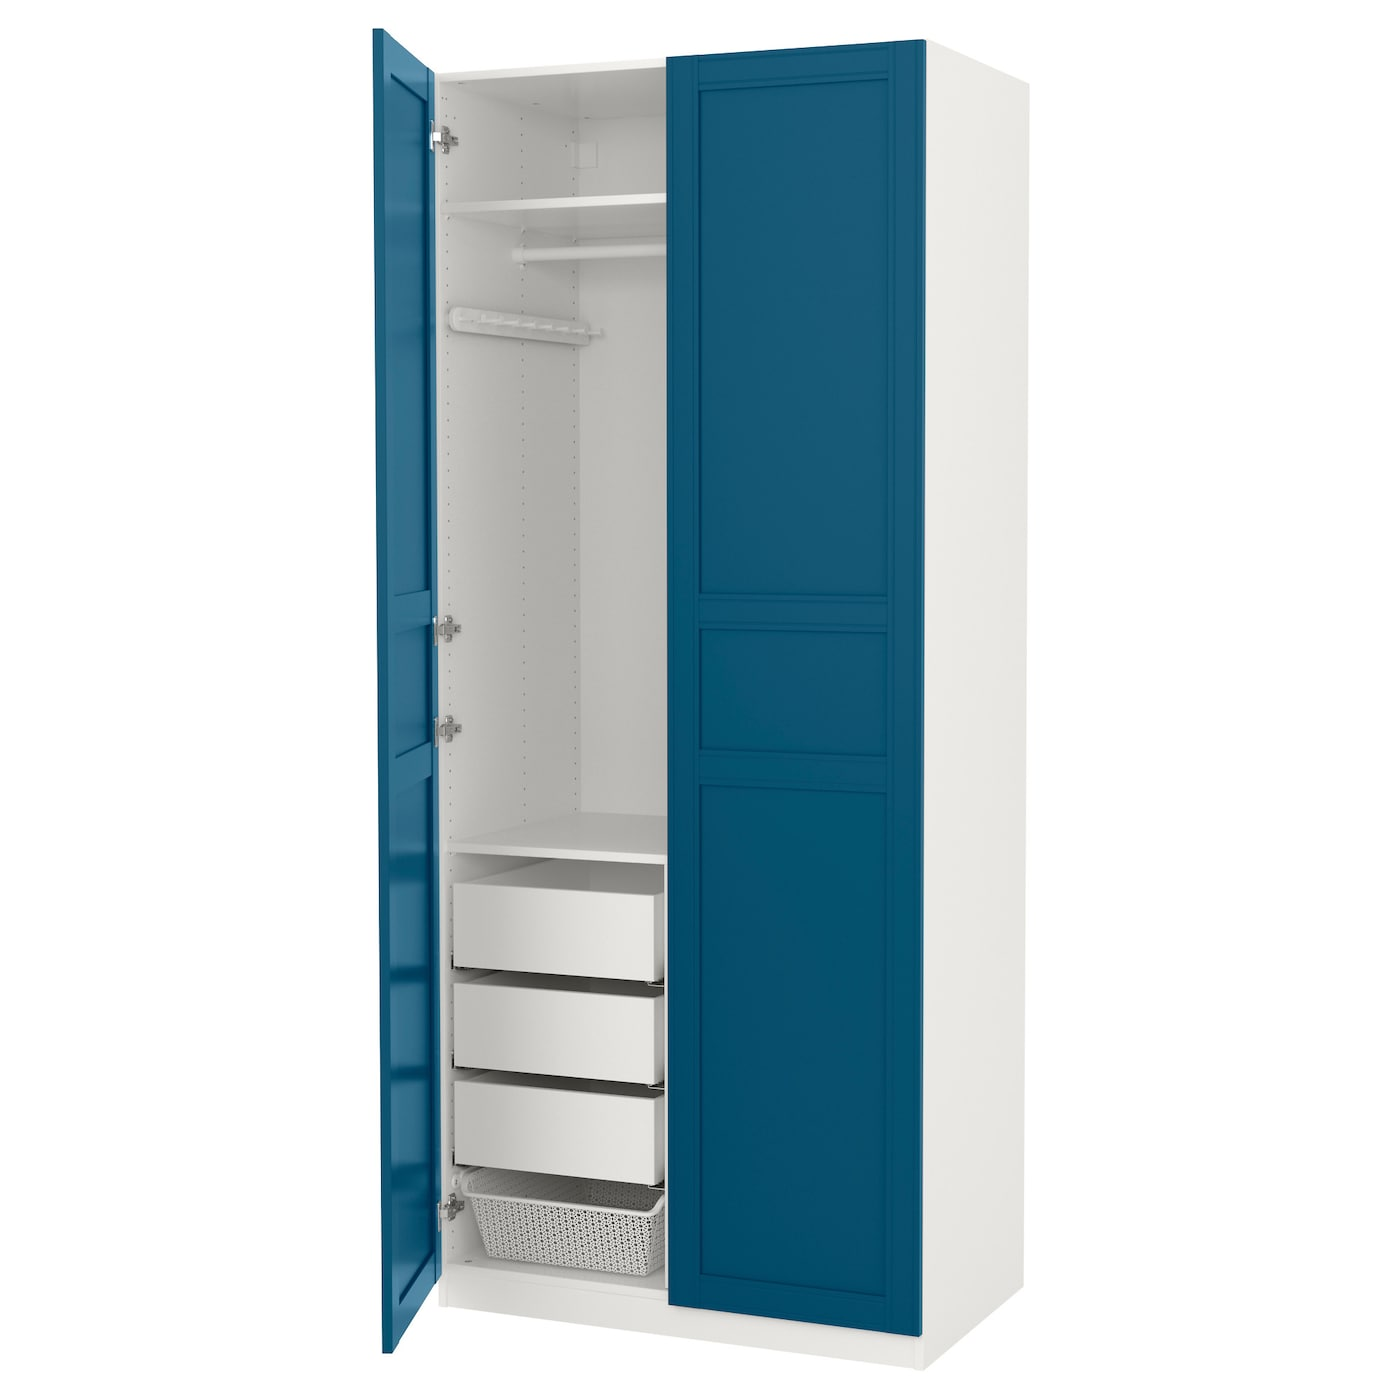 , , Flisberget Blue, 100X60X236